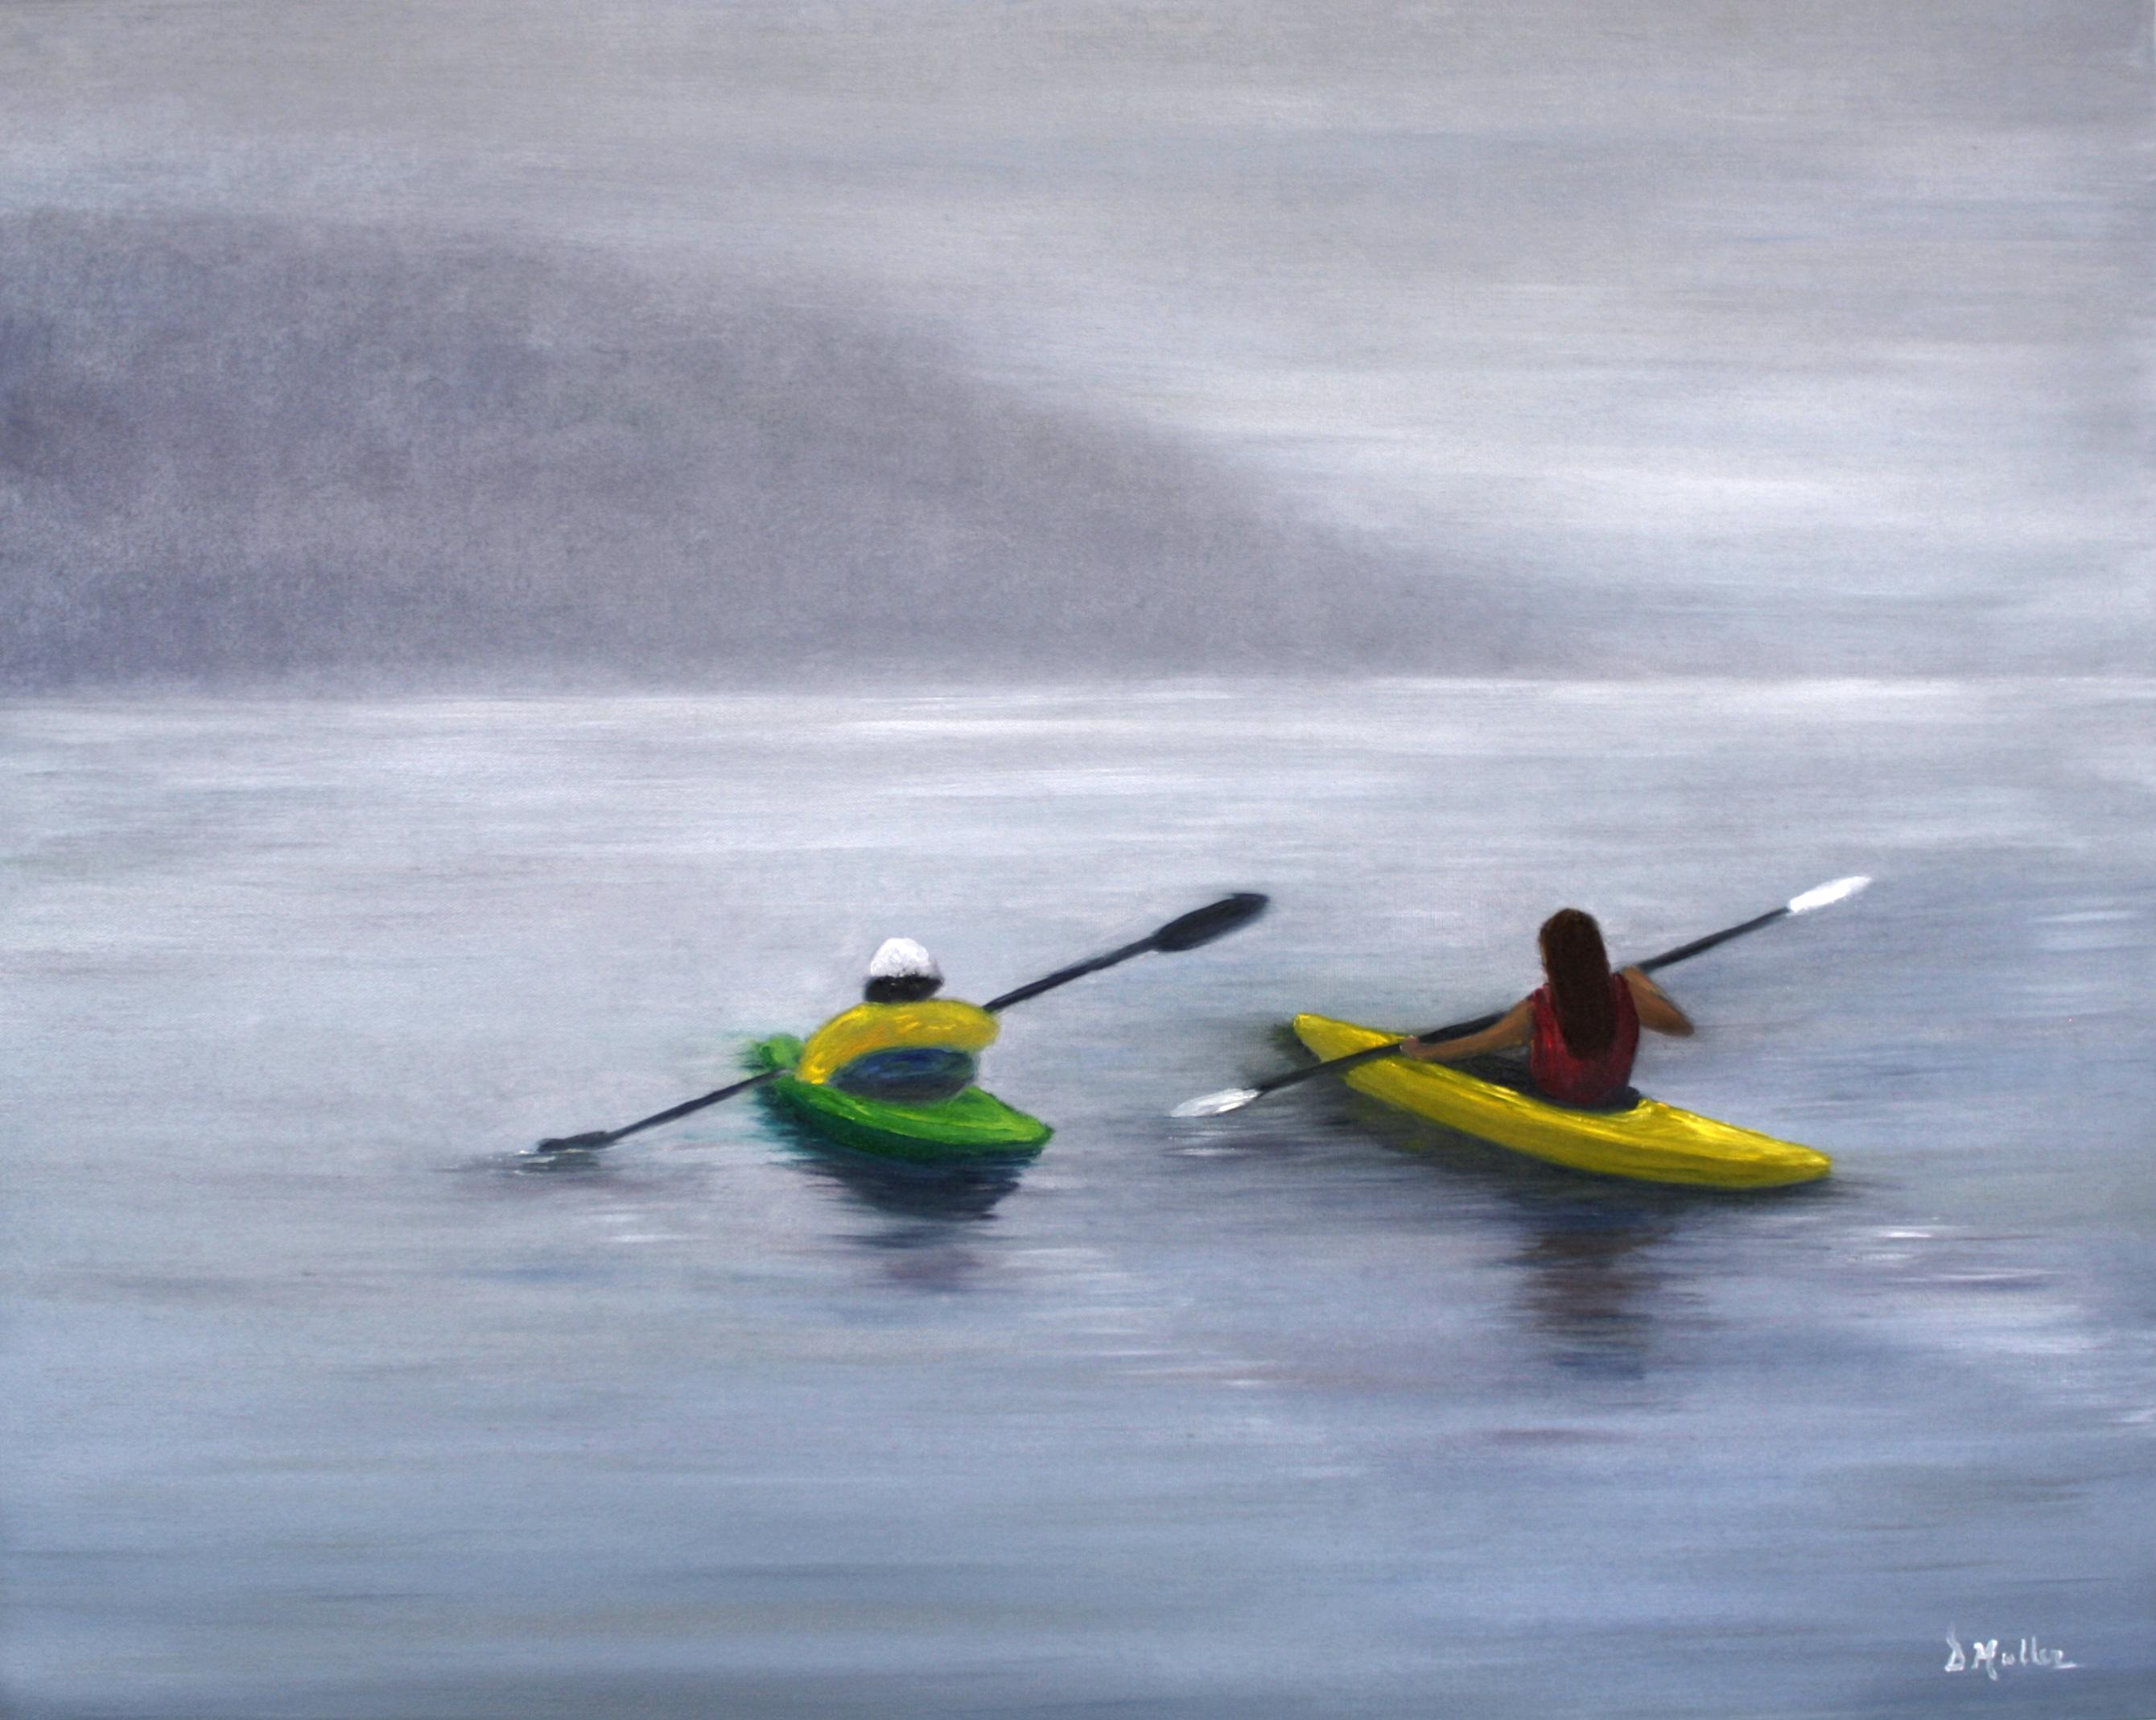 Kayaking, fog, ocean